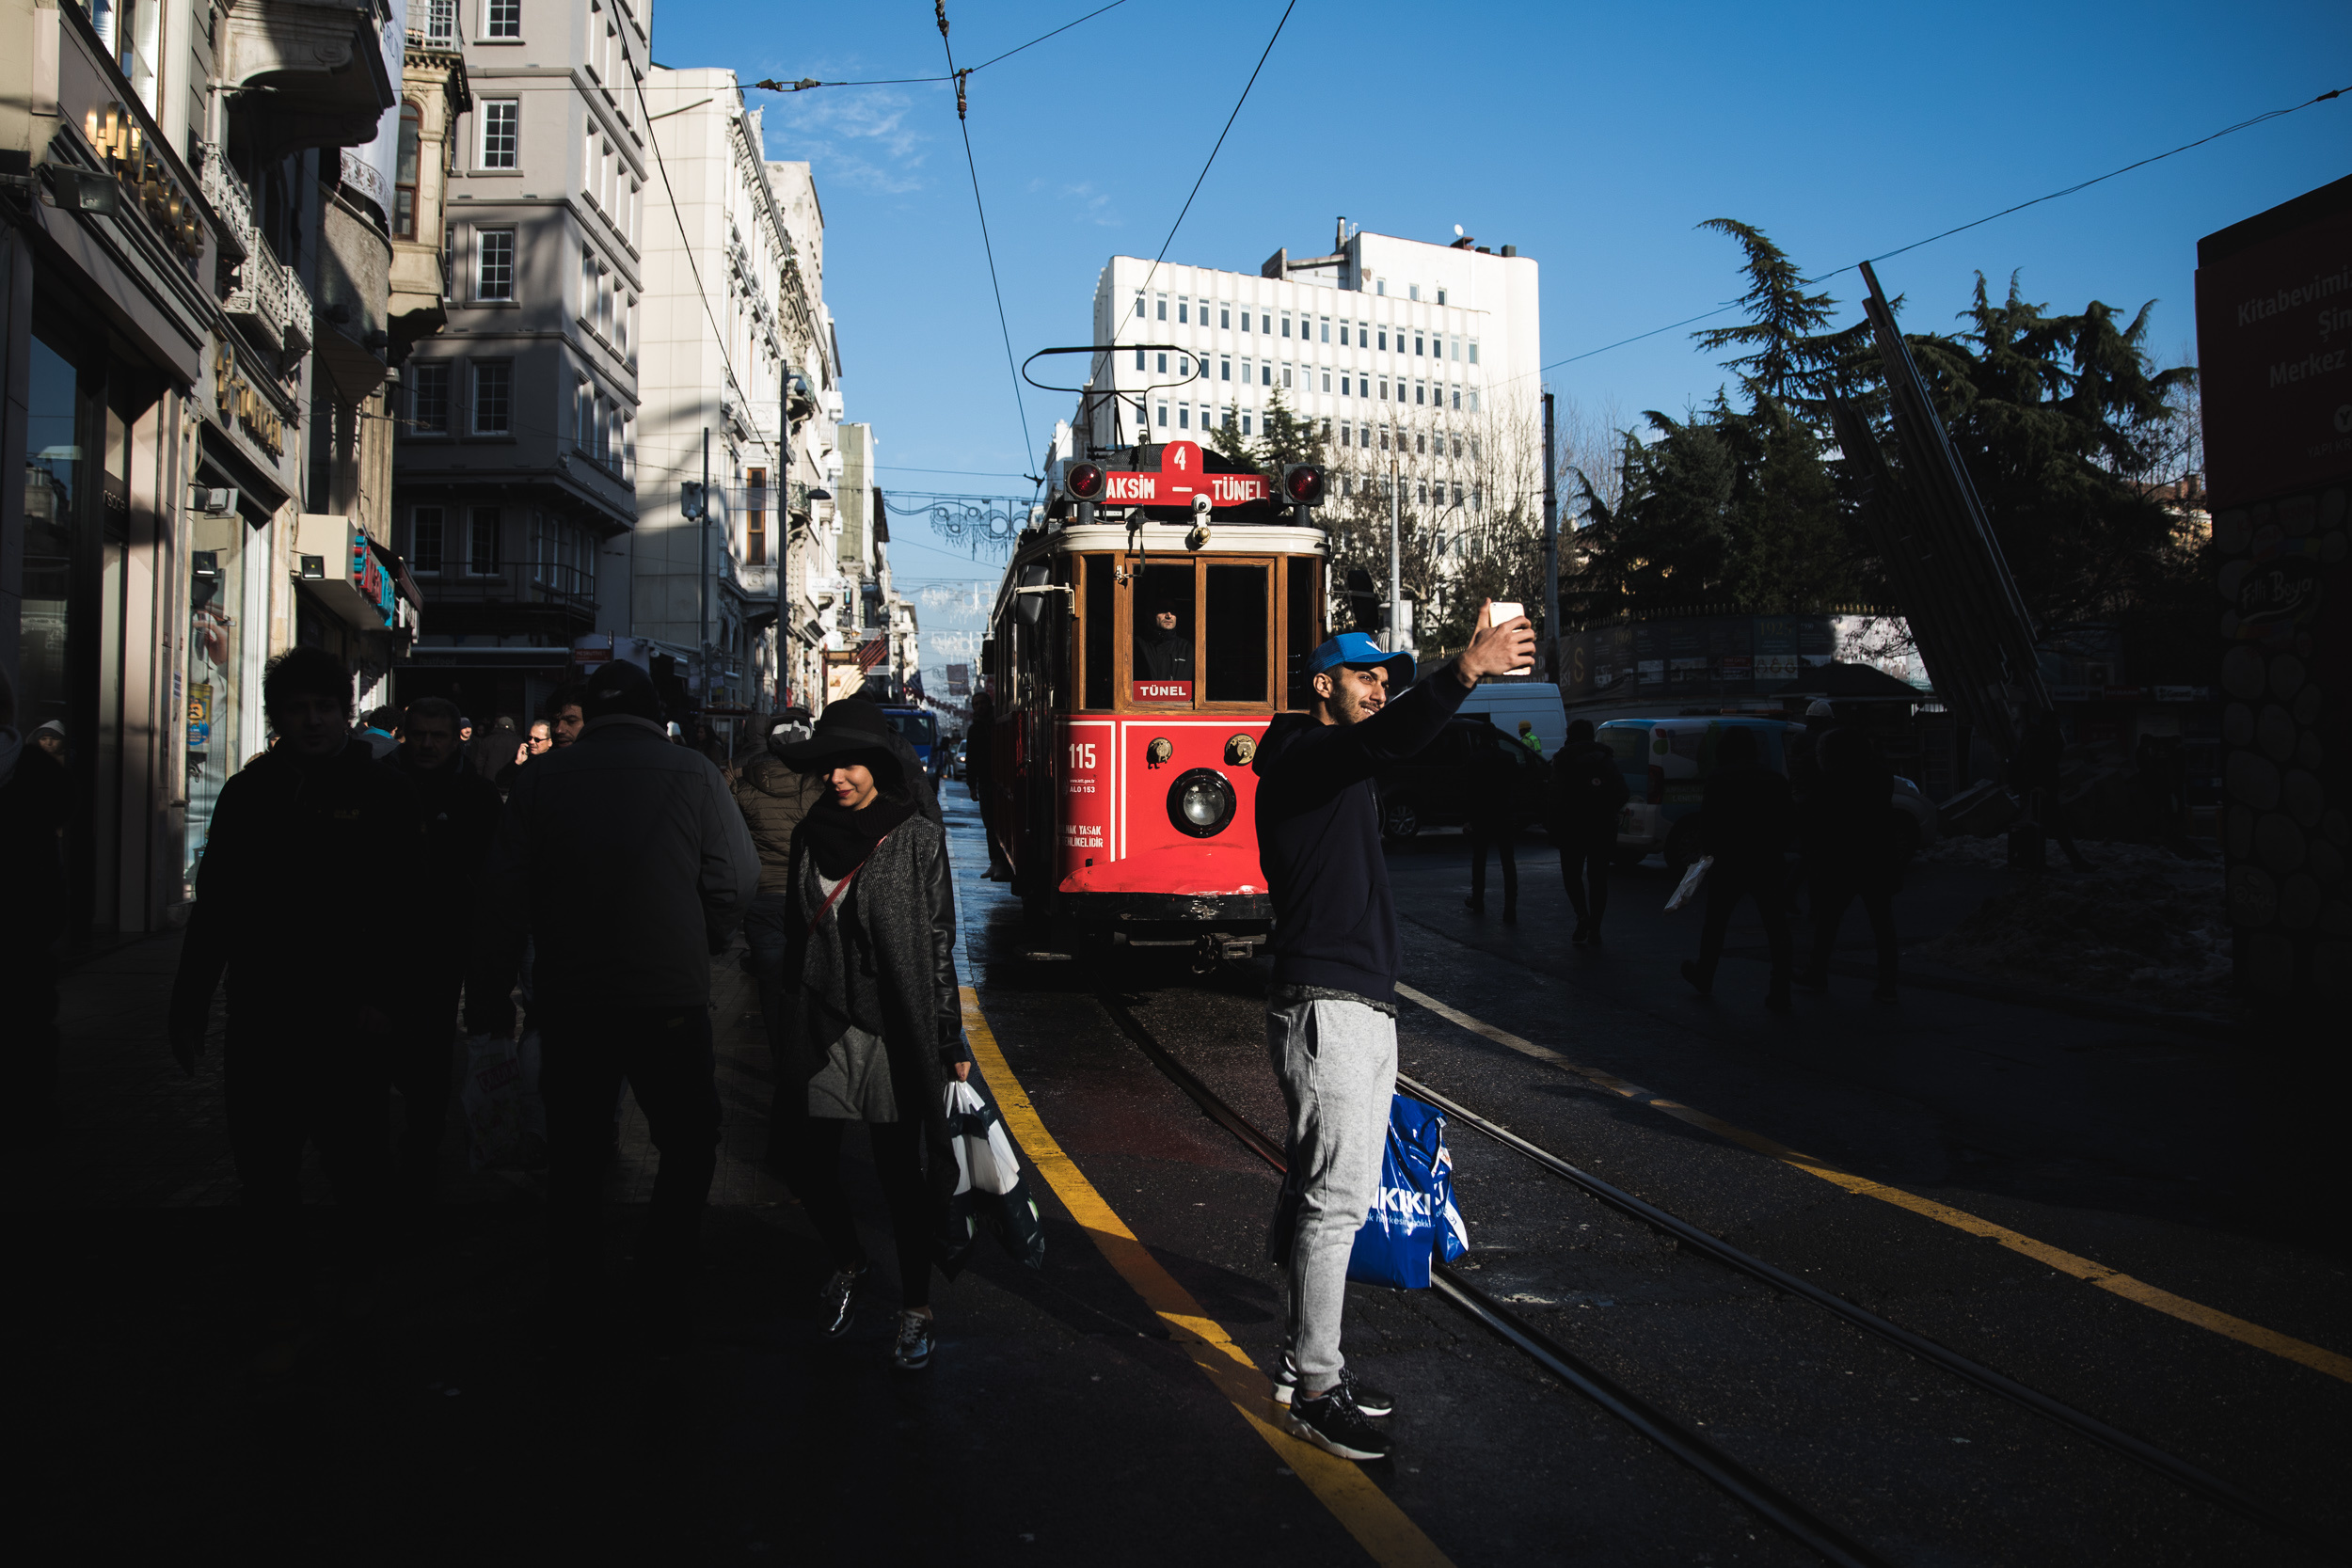 Istanbul_Snow_Rob_Pinney_05.jpg